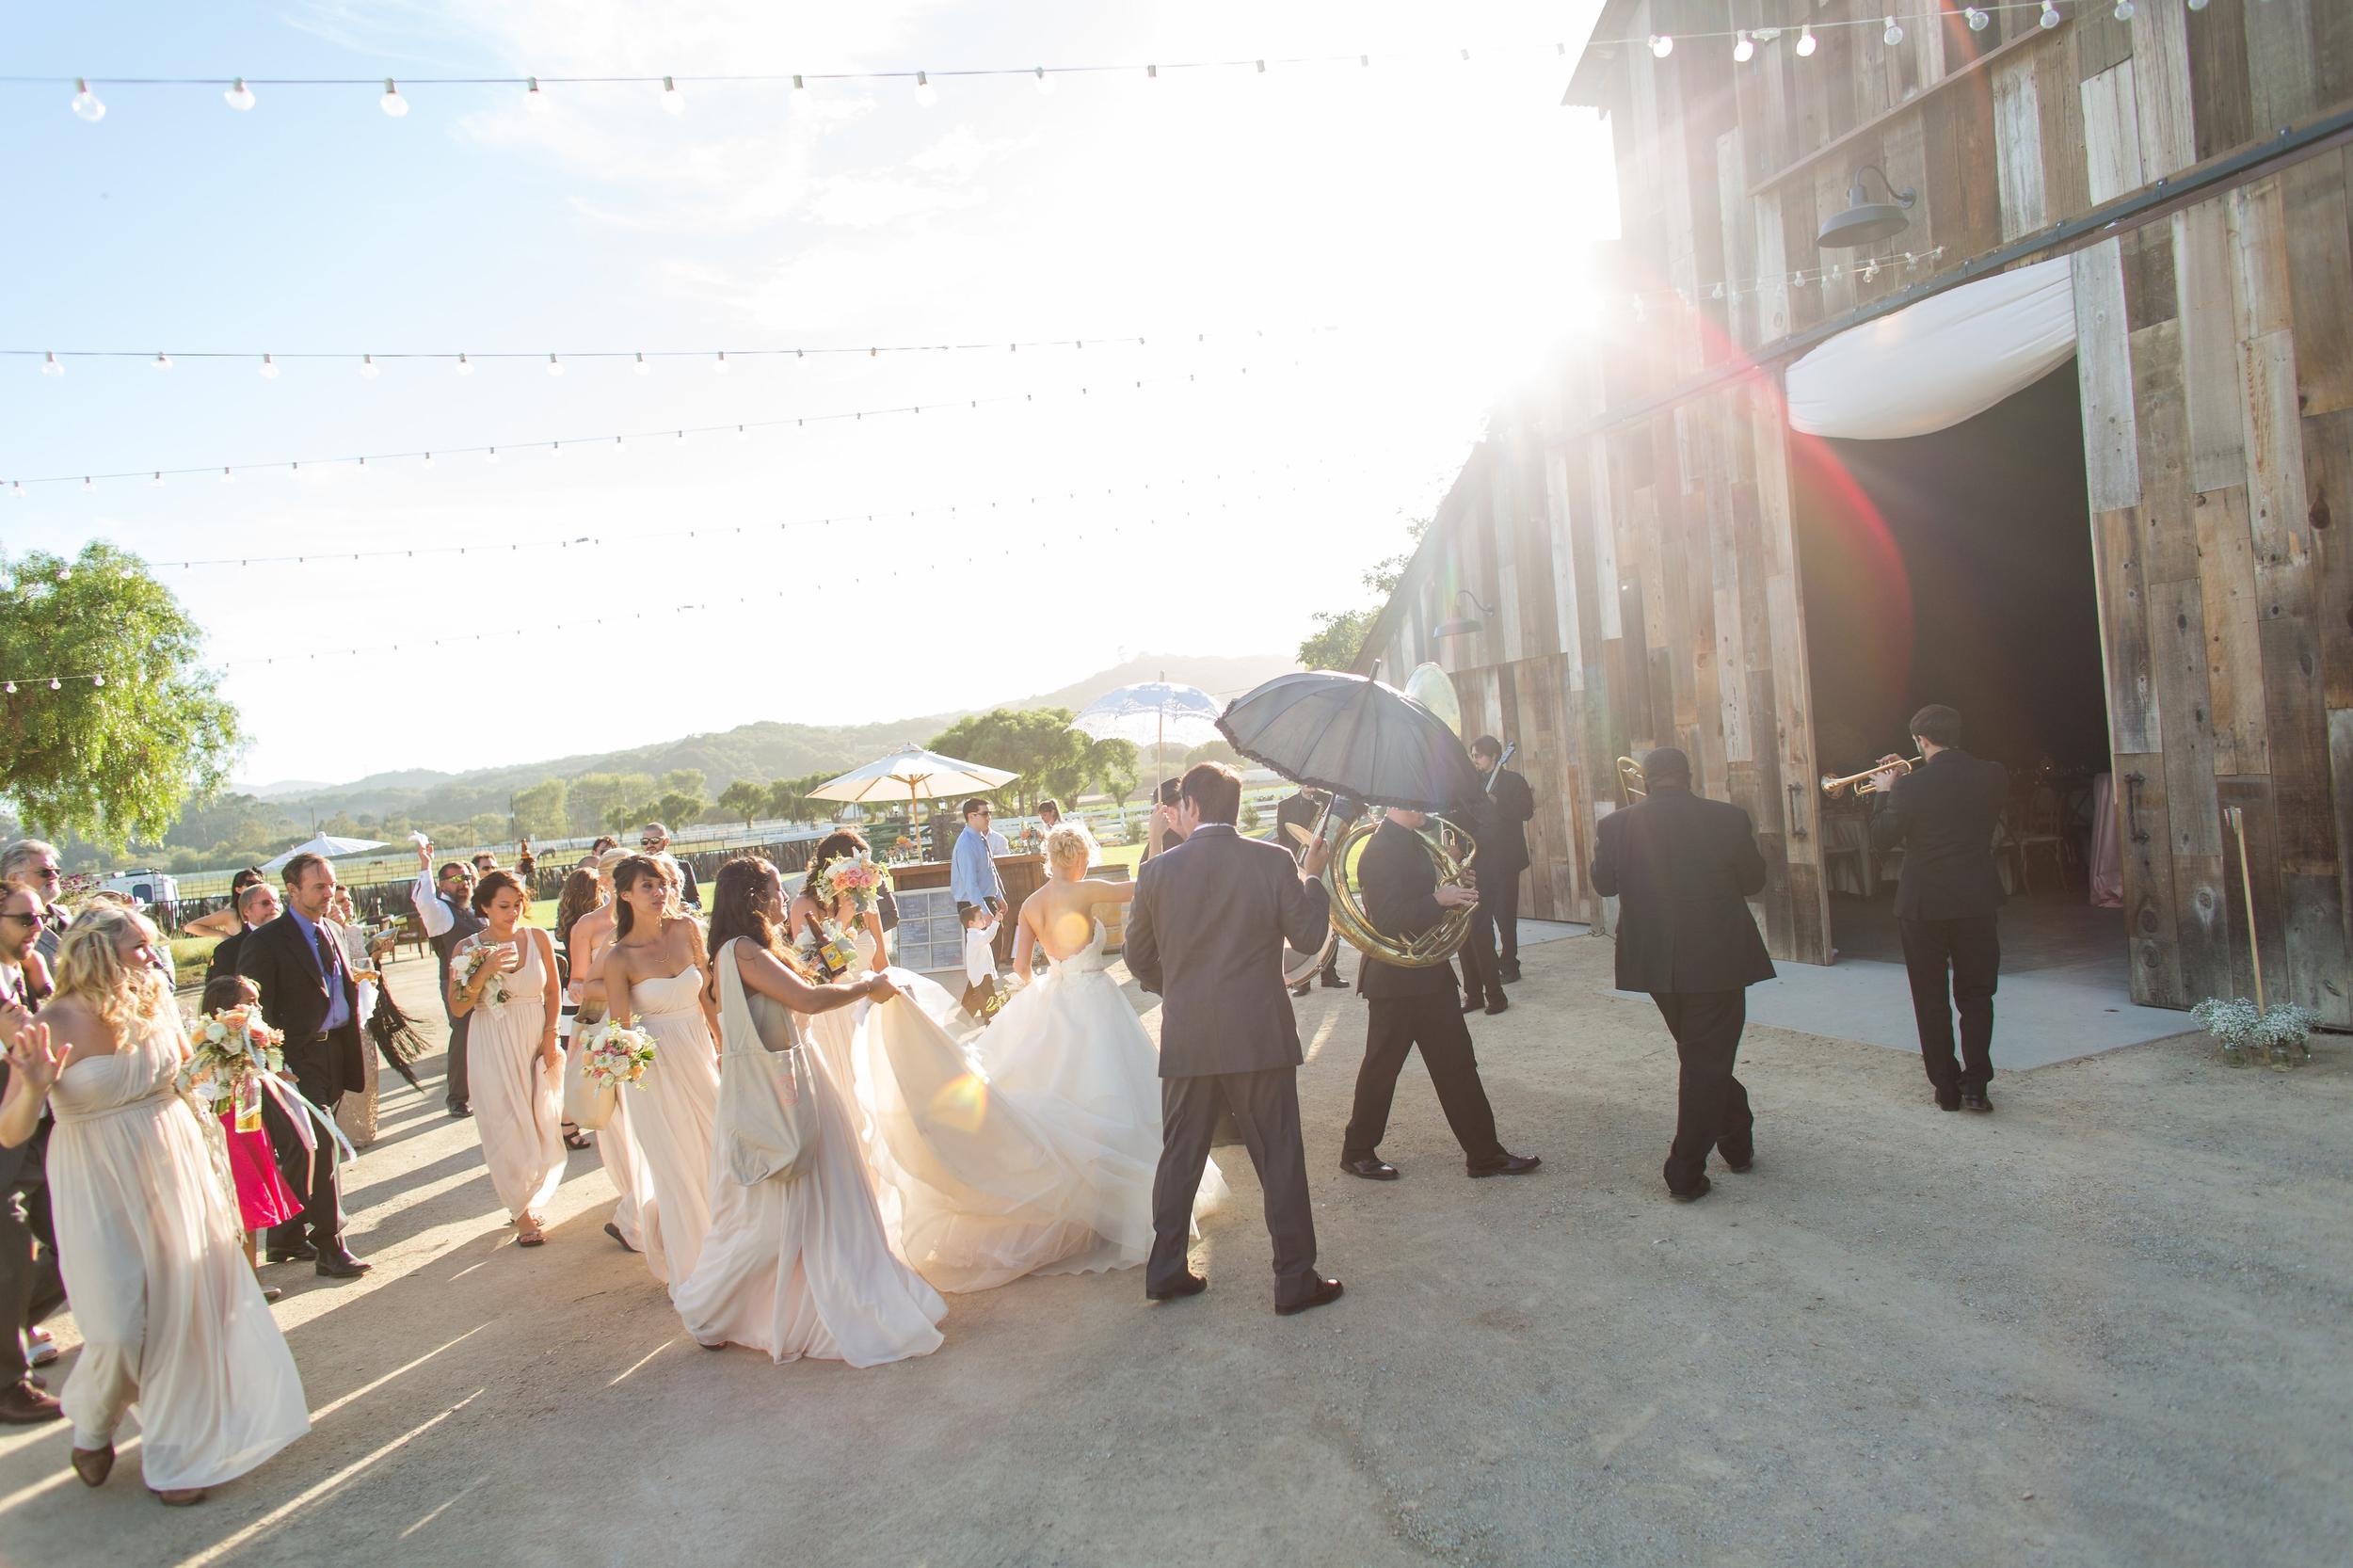 Emily + Matthew Wedding in San Luis Obispo, CA: The Mudbug Brass Band!